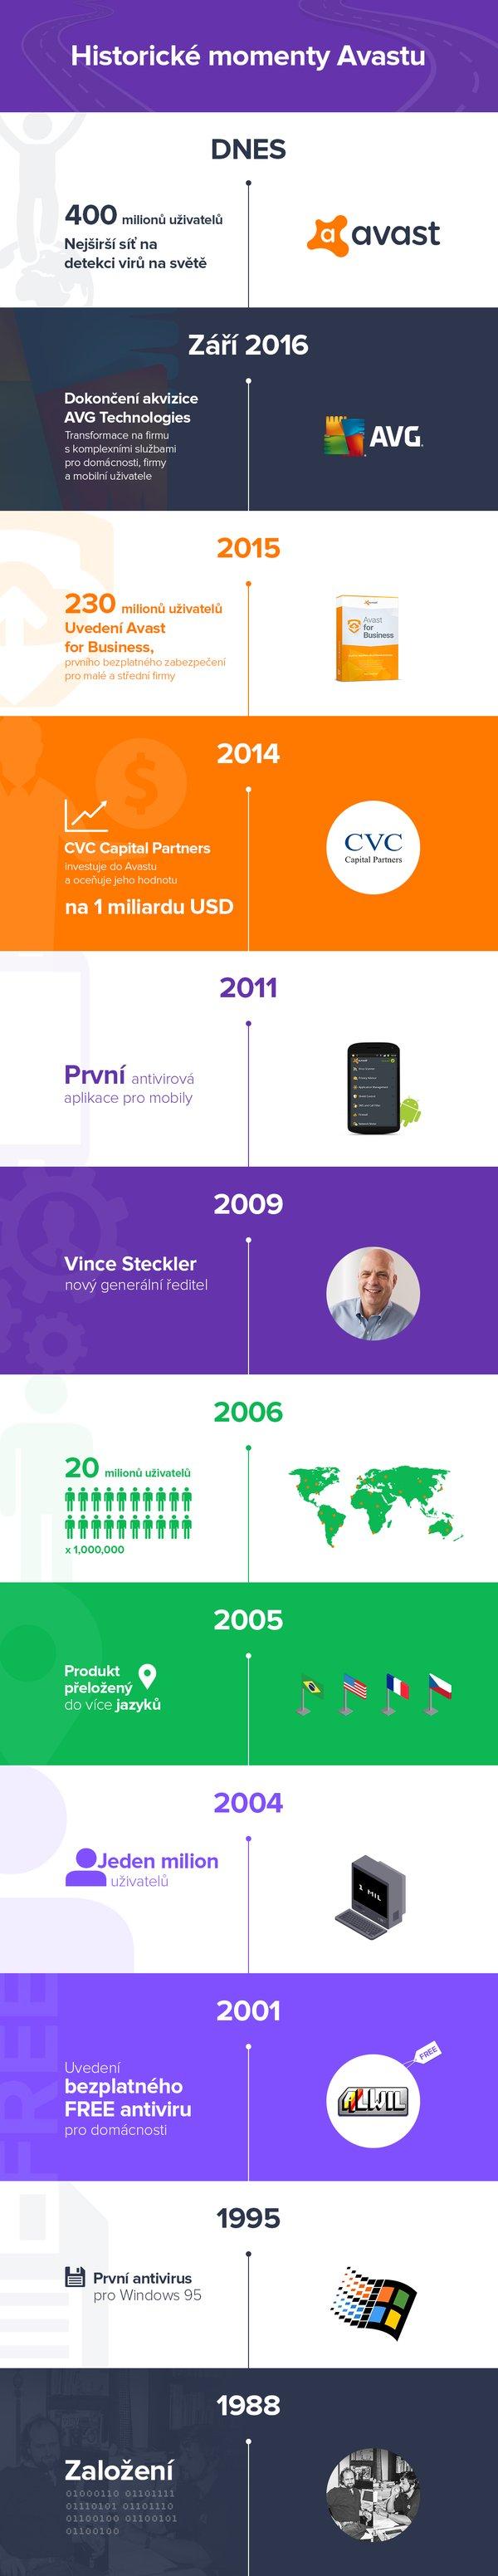 CZ_infographics_Avast_history.png